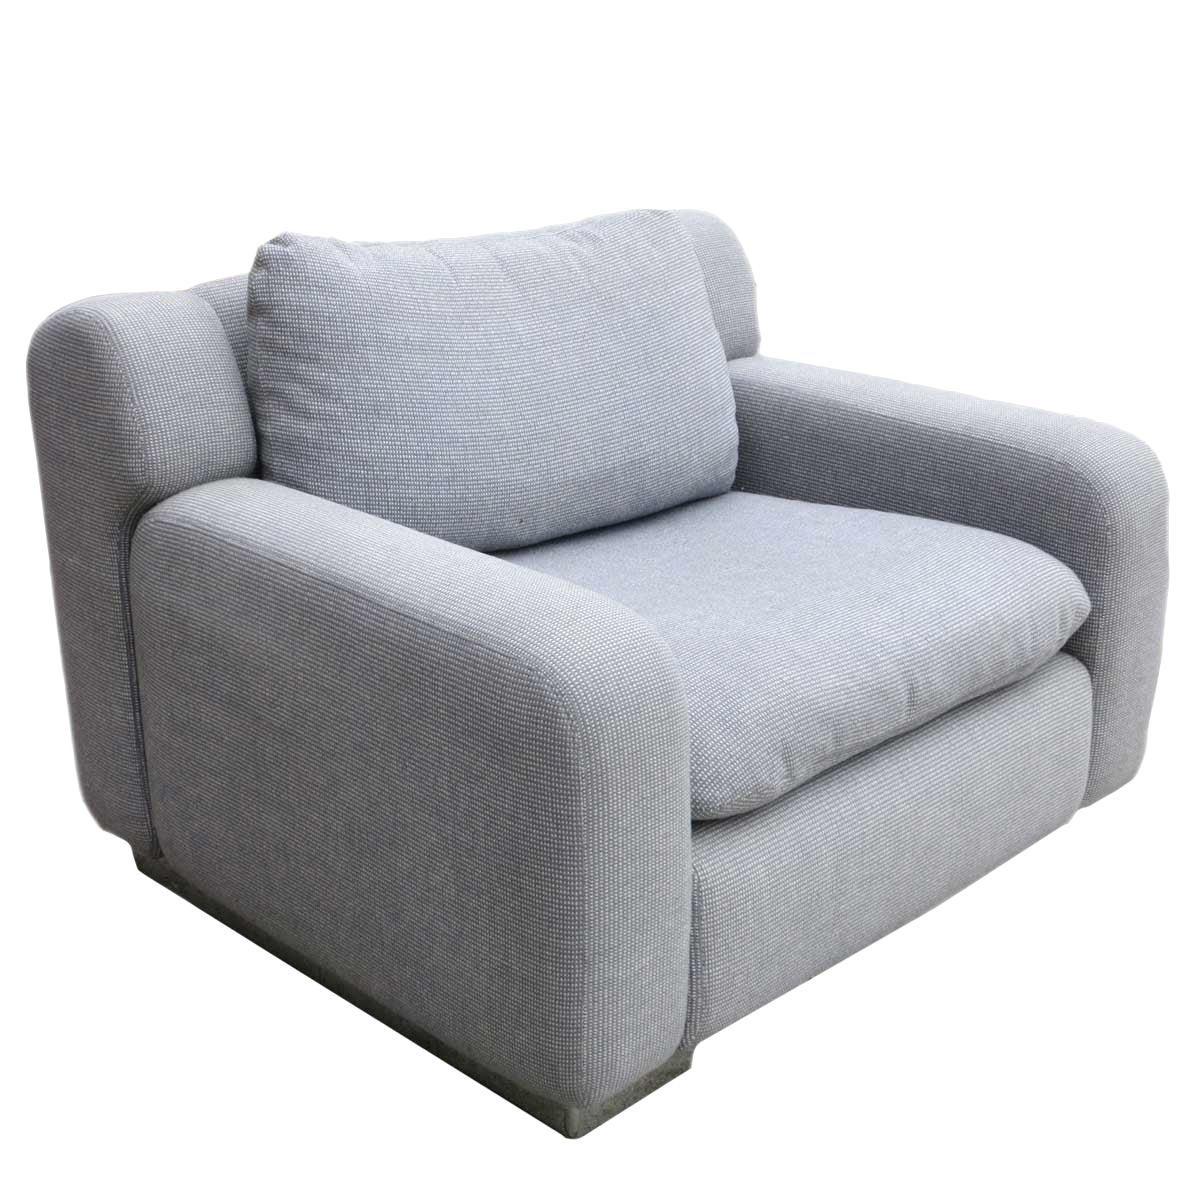 Modern Grey and Chrome Lounge Chair by George Kasparian